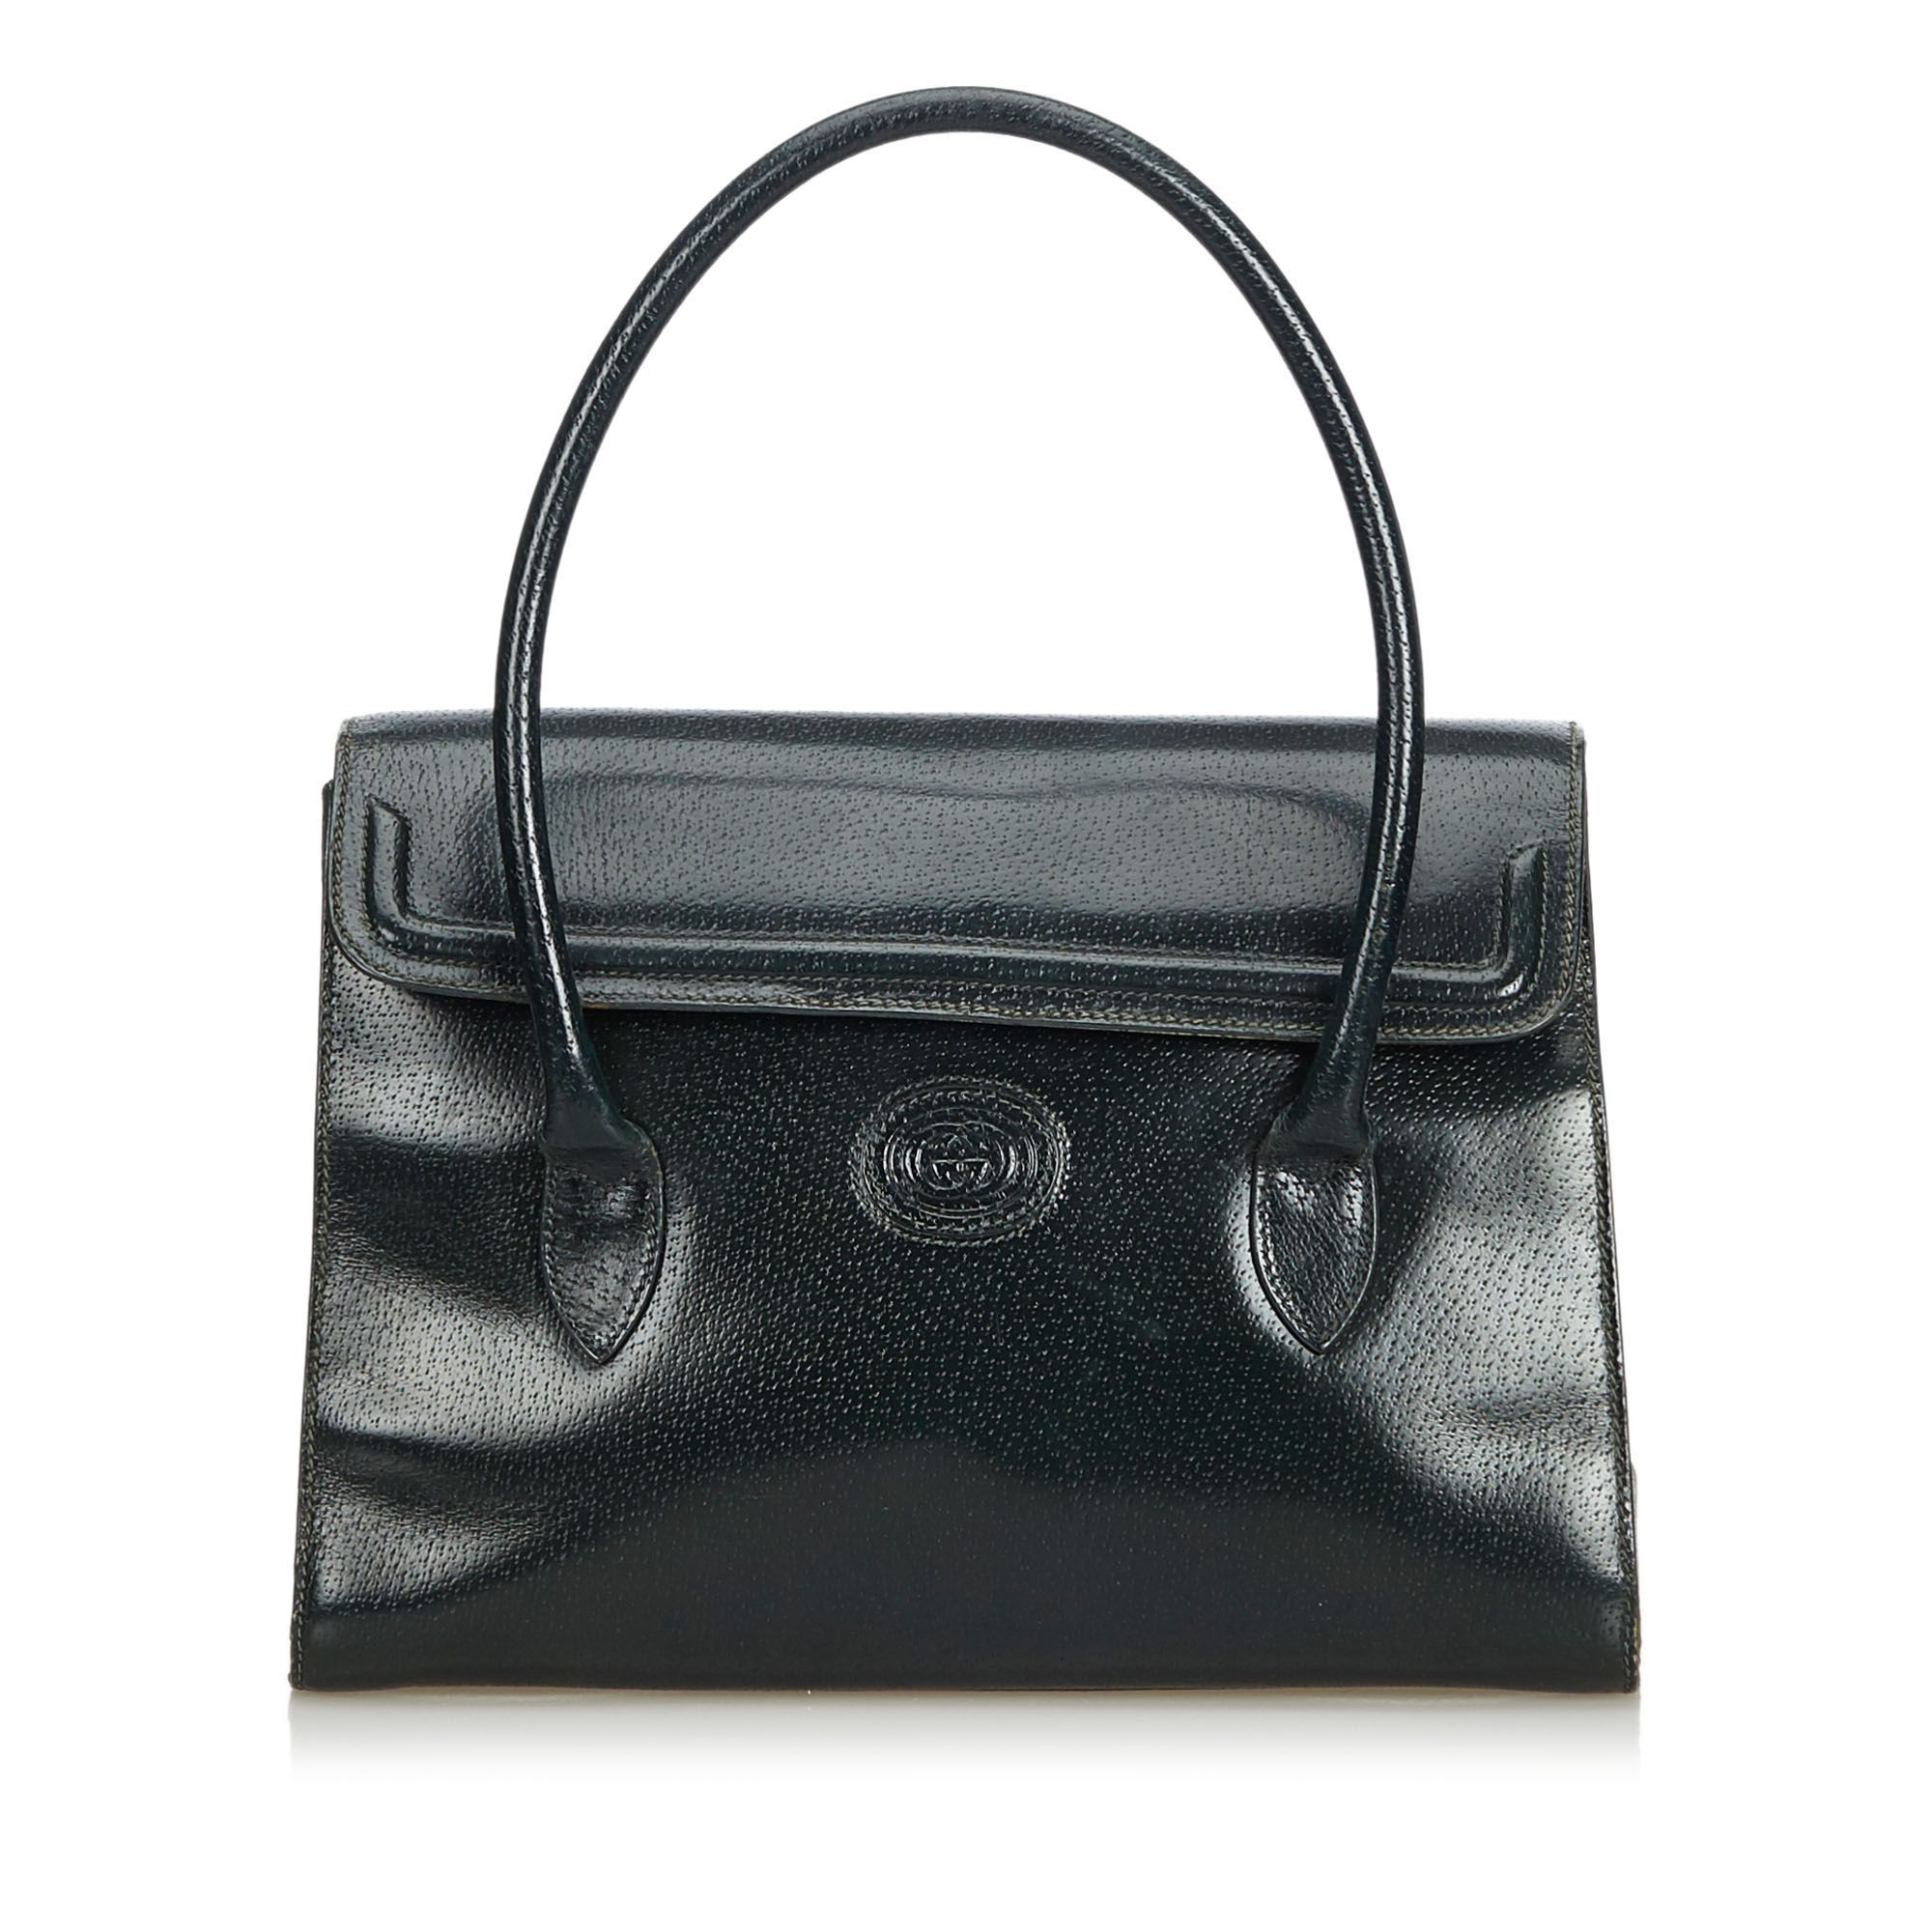 Vintage Gucci Leather Handbag Green